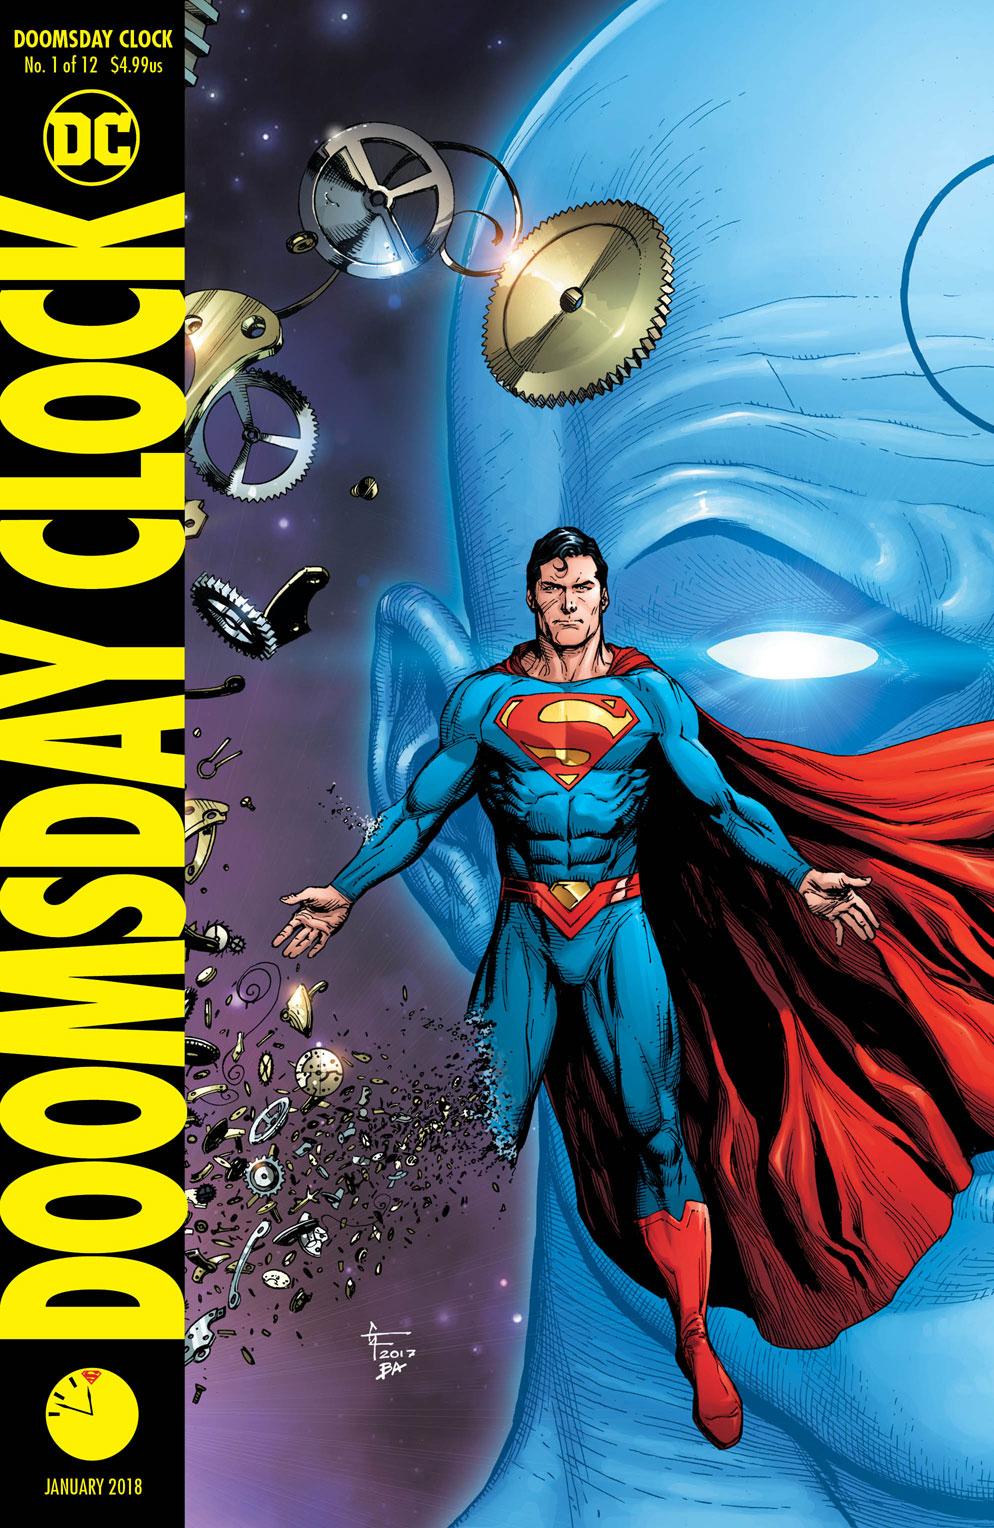 Doomsday Clock Variant 1 - DC Comics News